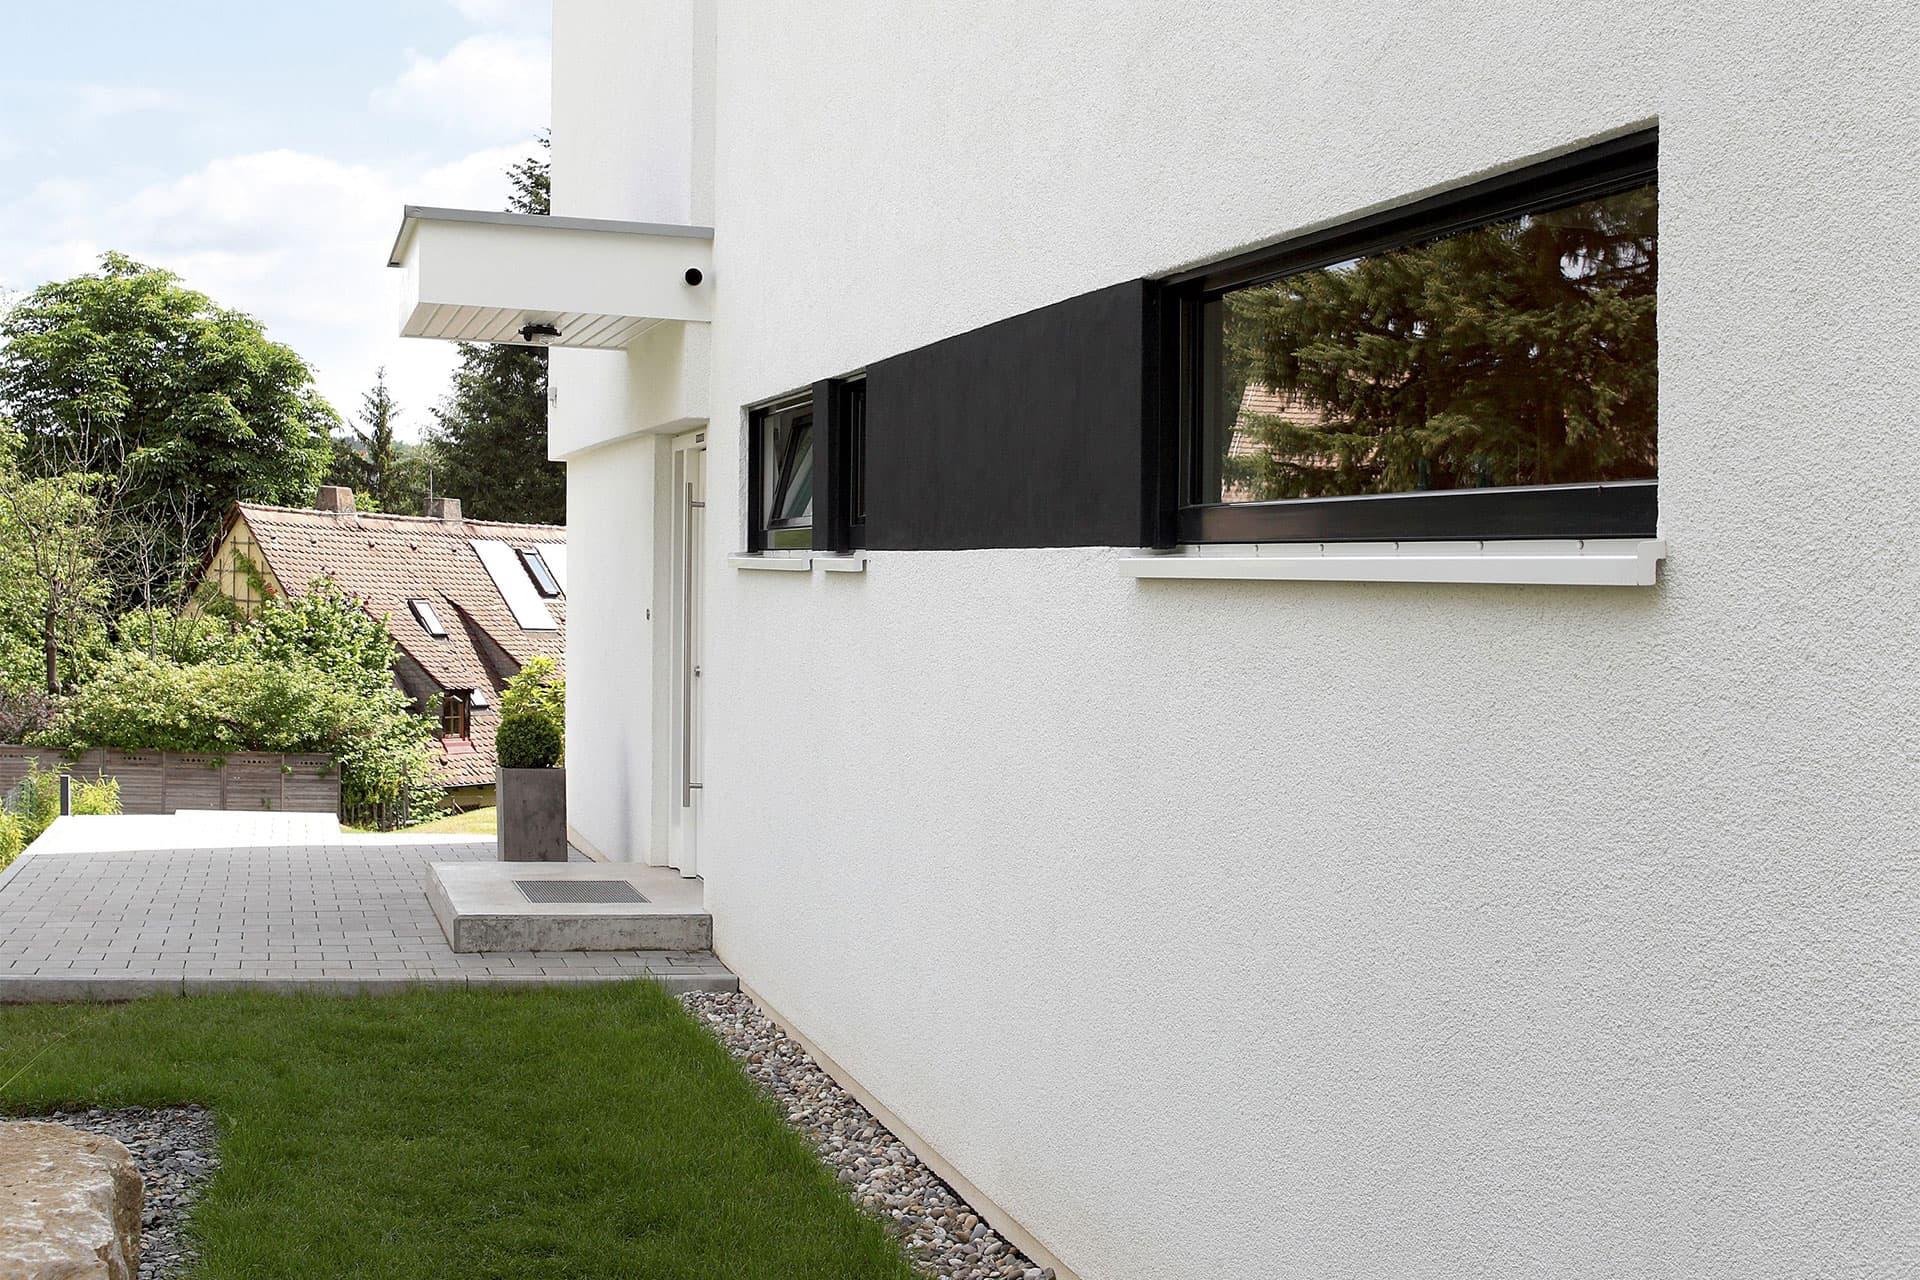 Moderne fensterformate  GUSSEK HAUS - Einfamilienhaus Modell